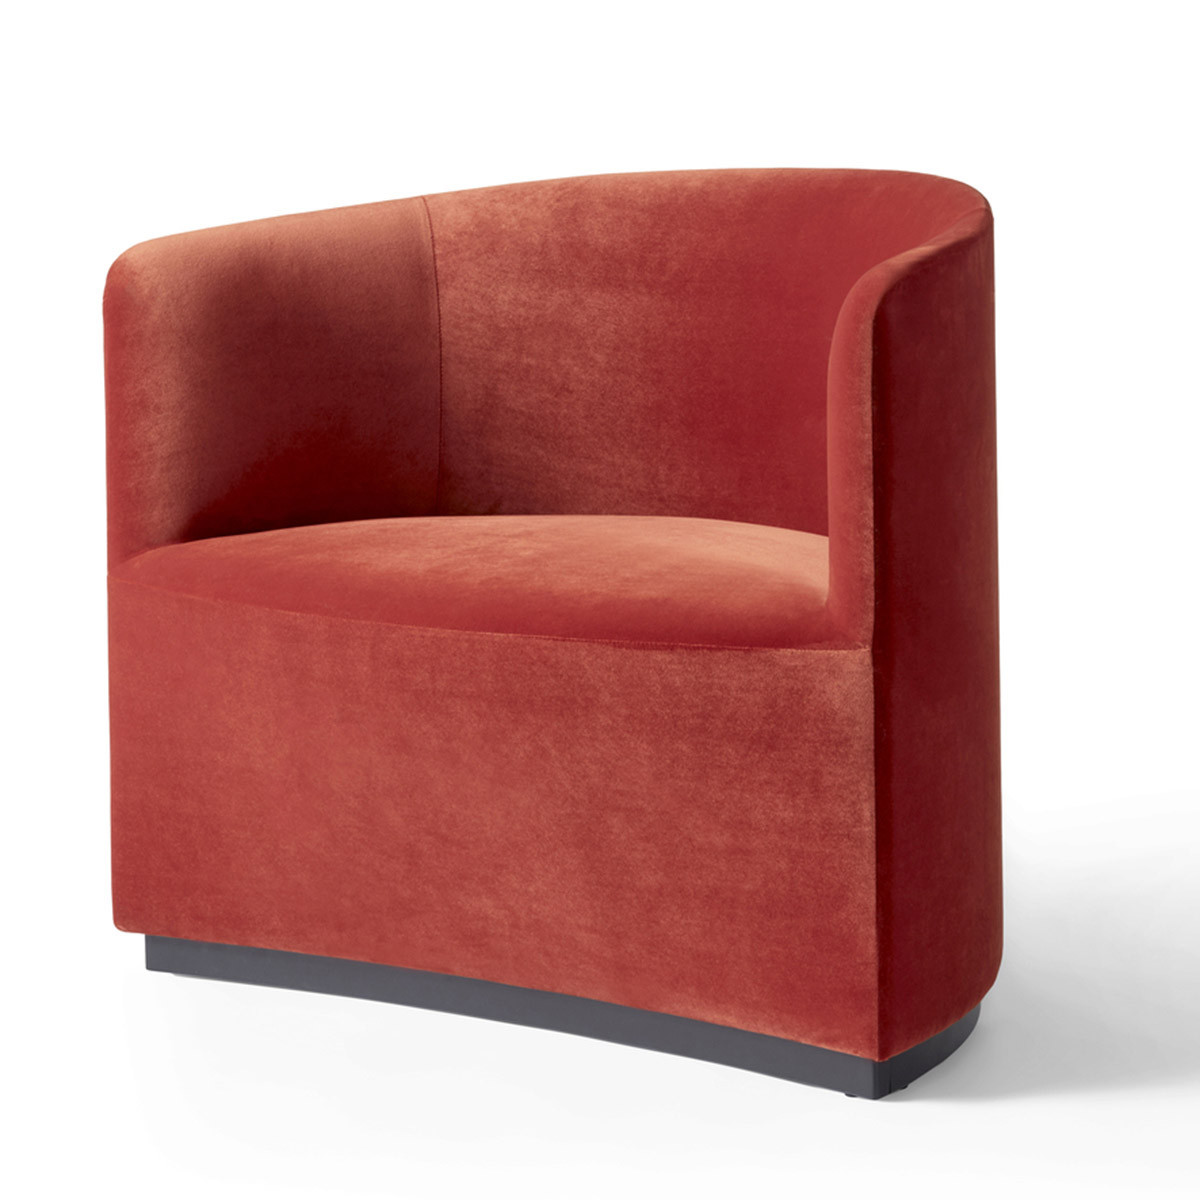 Menu Tearoom Club Chair